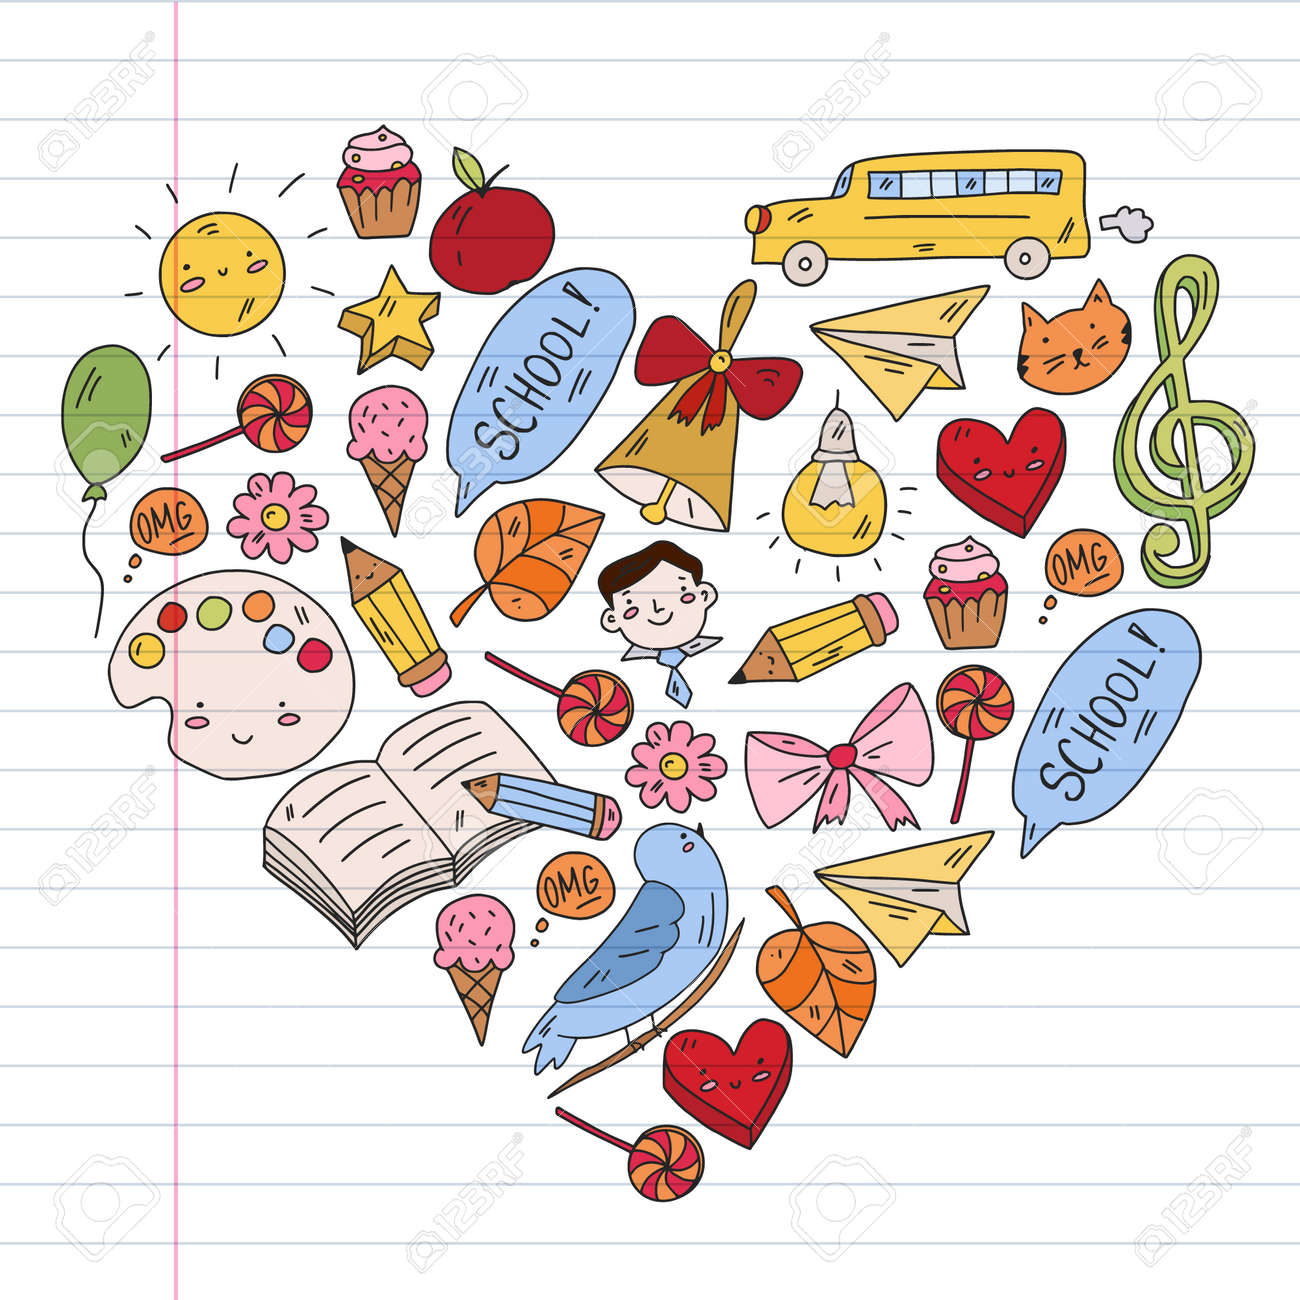 School, kindergarten with cute vector children. Creativity and imagination. Dancing, singing, painting, online education. - 173370203